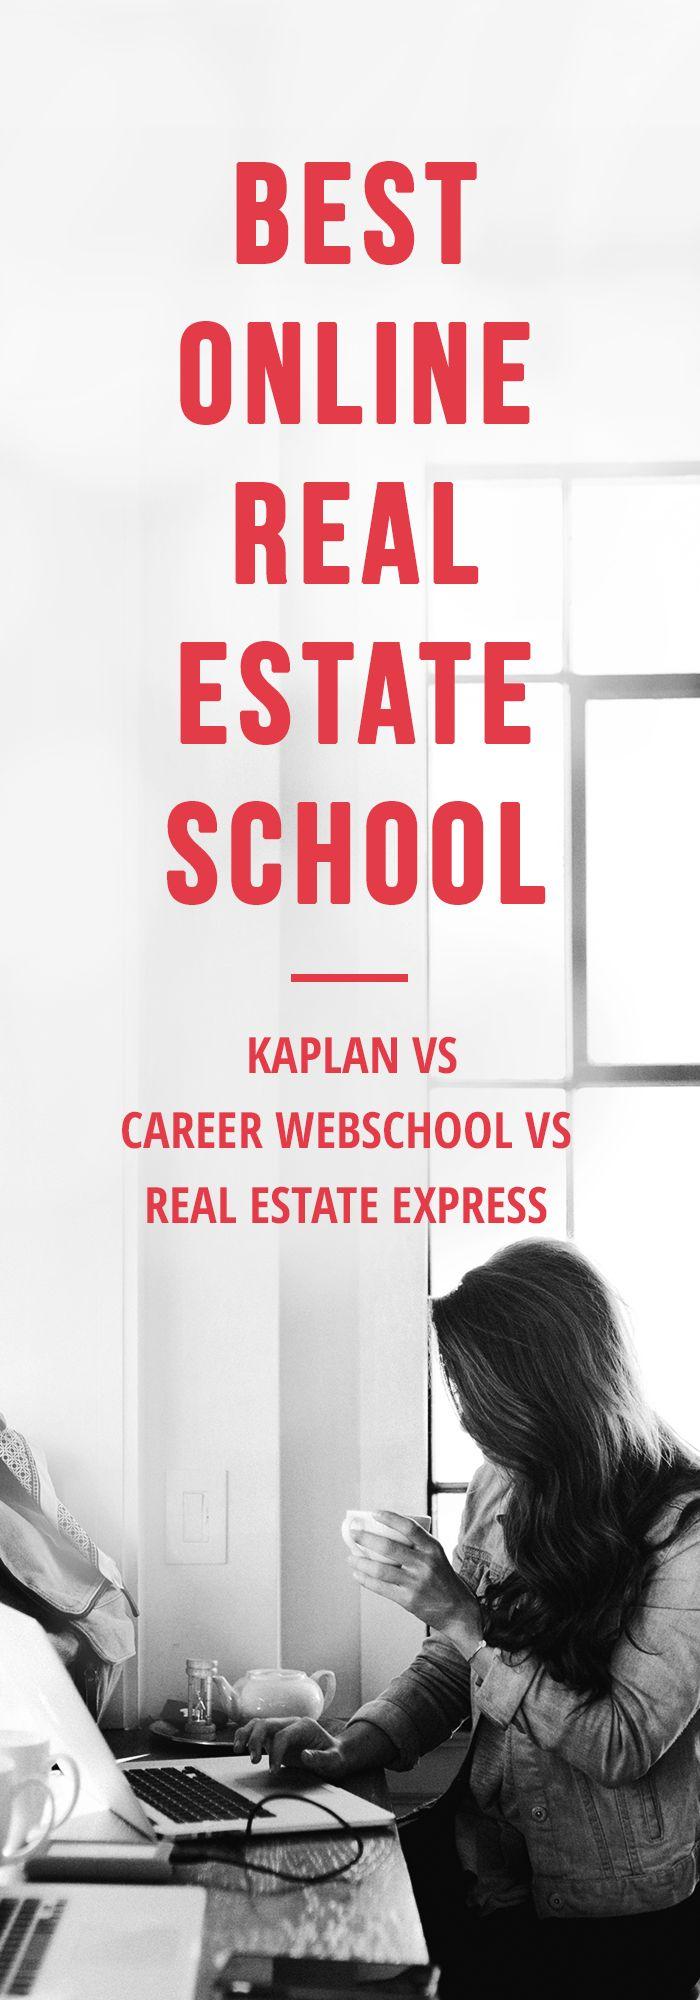 Best Online Real Estate School – Kaplan vs Career Webschool vs Real Estate Express